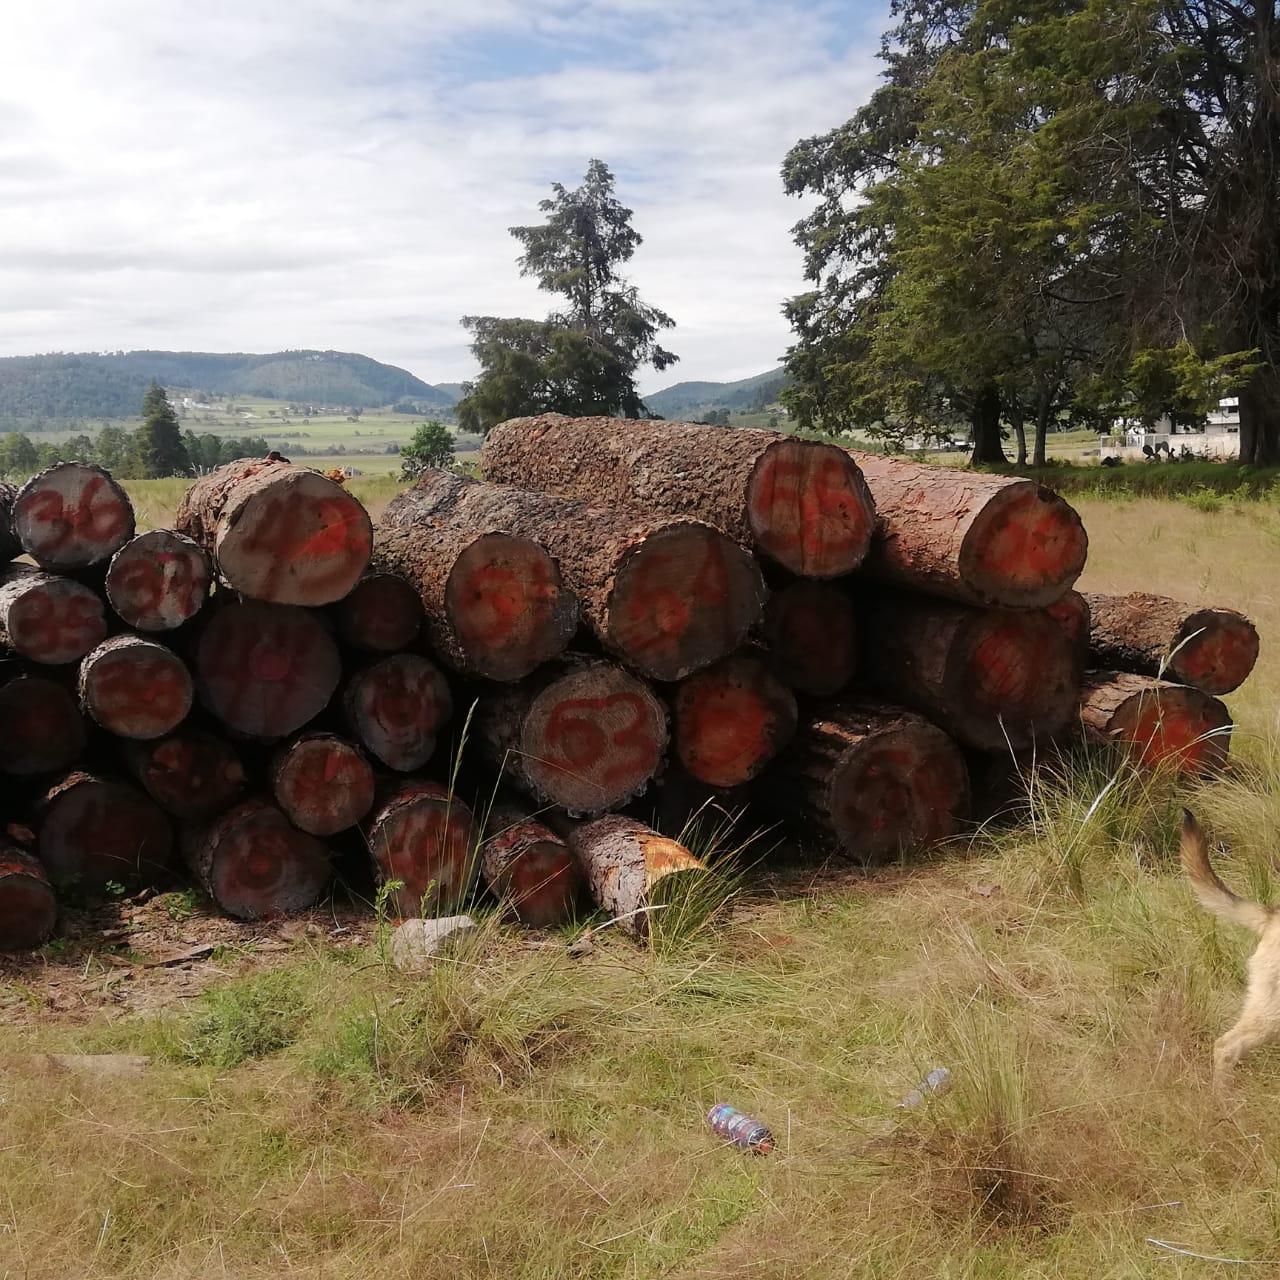 Por tala ilegal, cayó el Mil Amores en Ahuazotepec